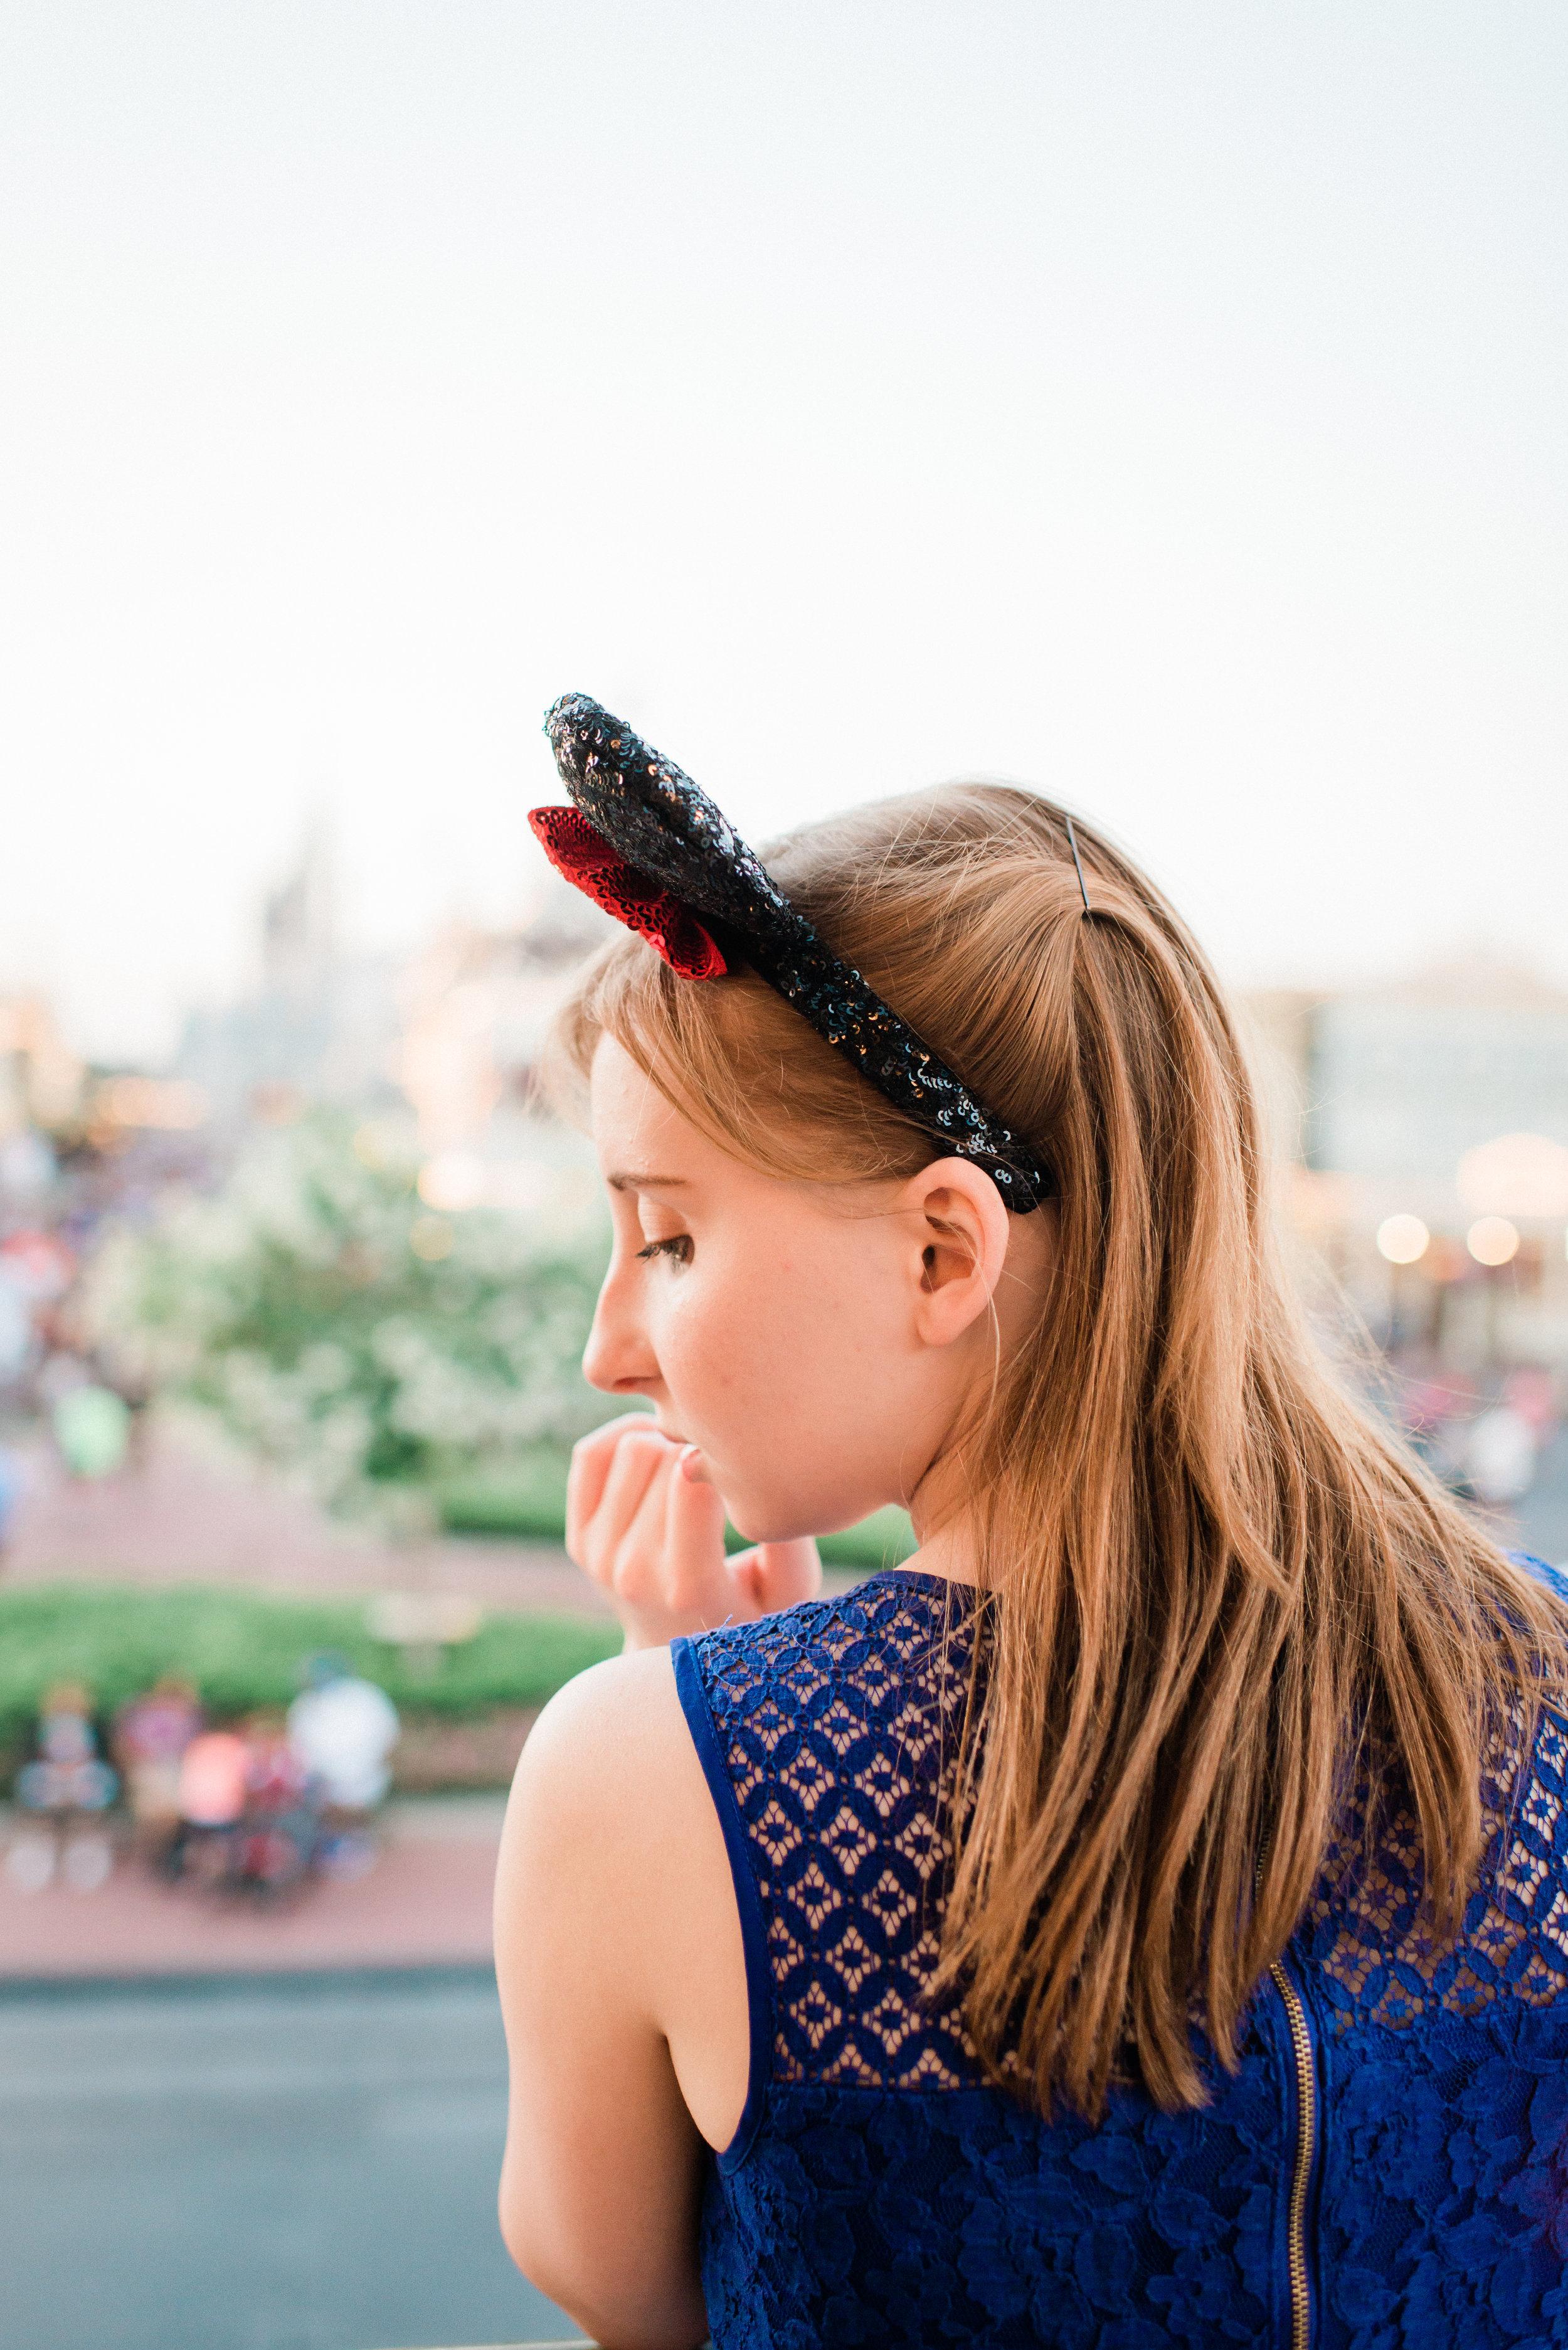 KateTaramykinStudios-Disney-World-Magic-Kingdom-Portraits-Jess-21.jpg